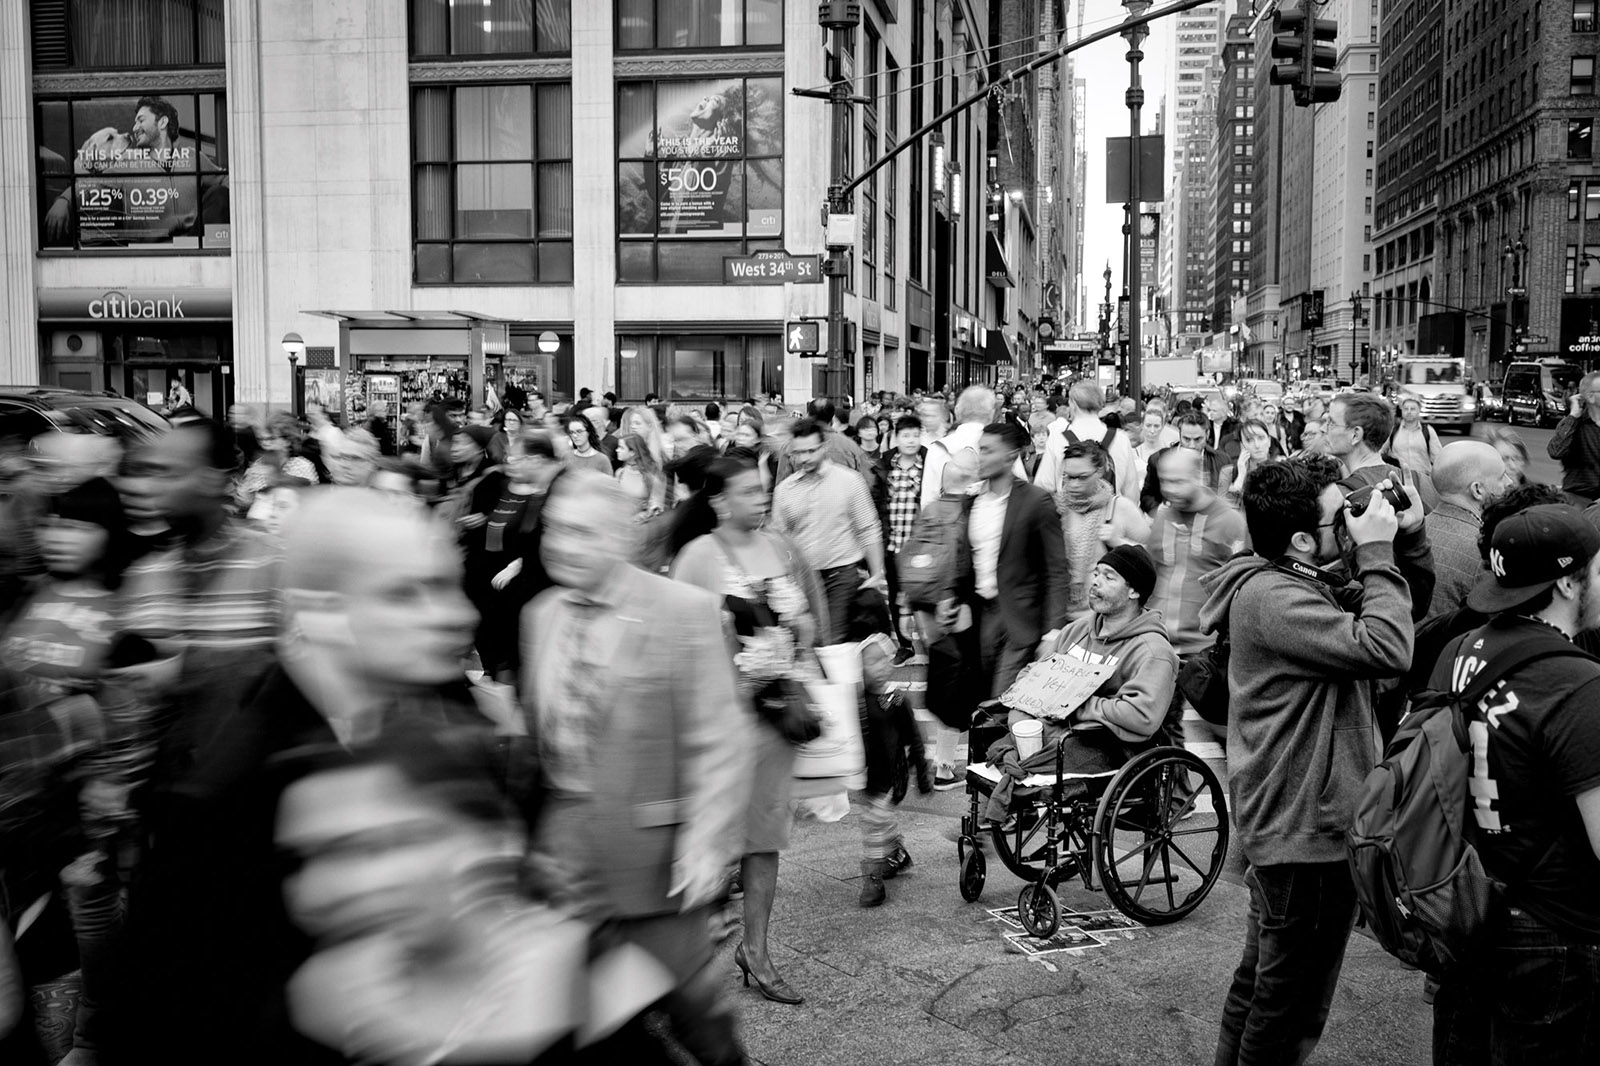 Rush-hour on 34th Street, New York City, February 21, 2018